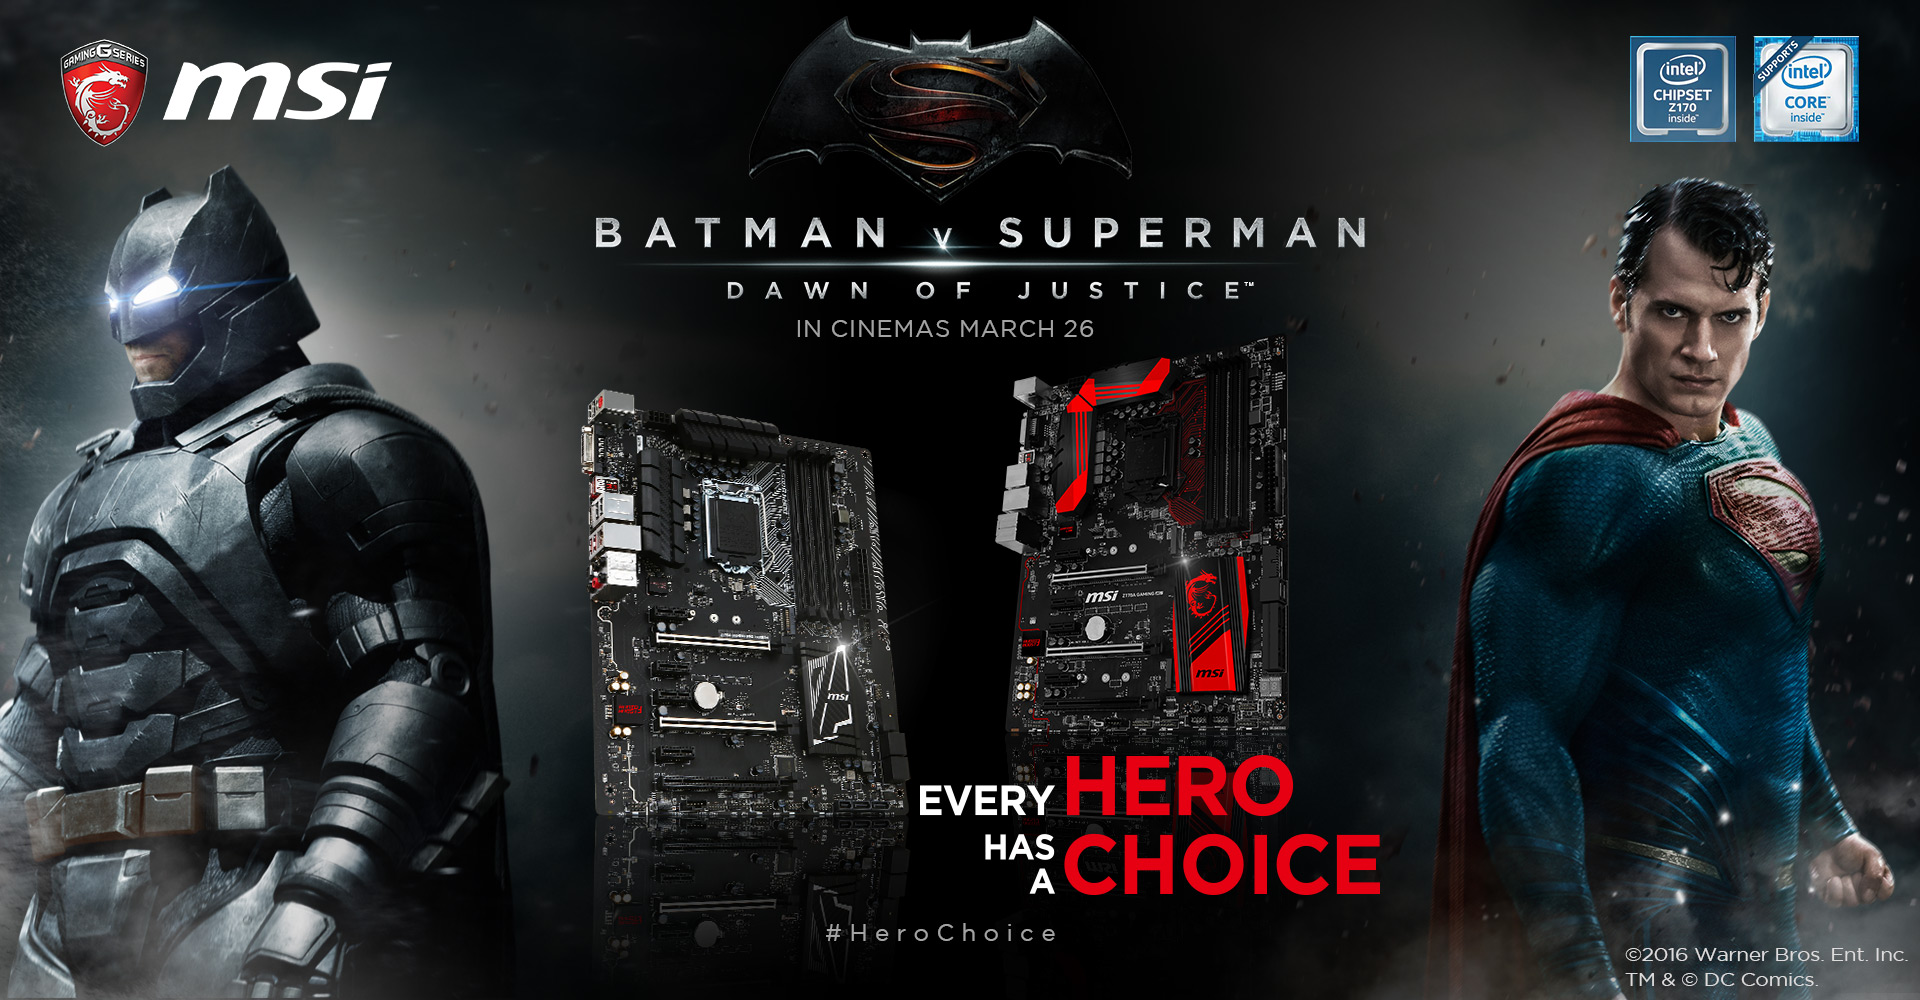 Msi X Batman V Superman Dawn Of Justice Msi Z170 Gaming